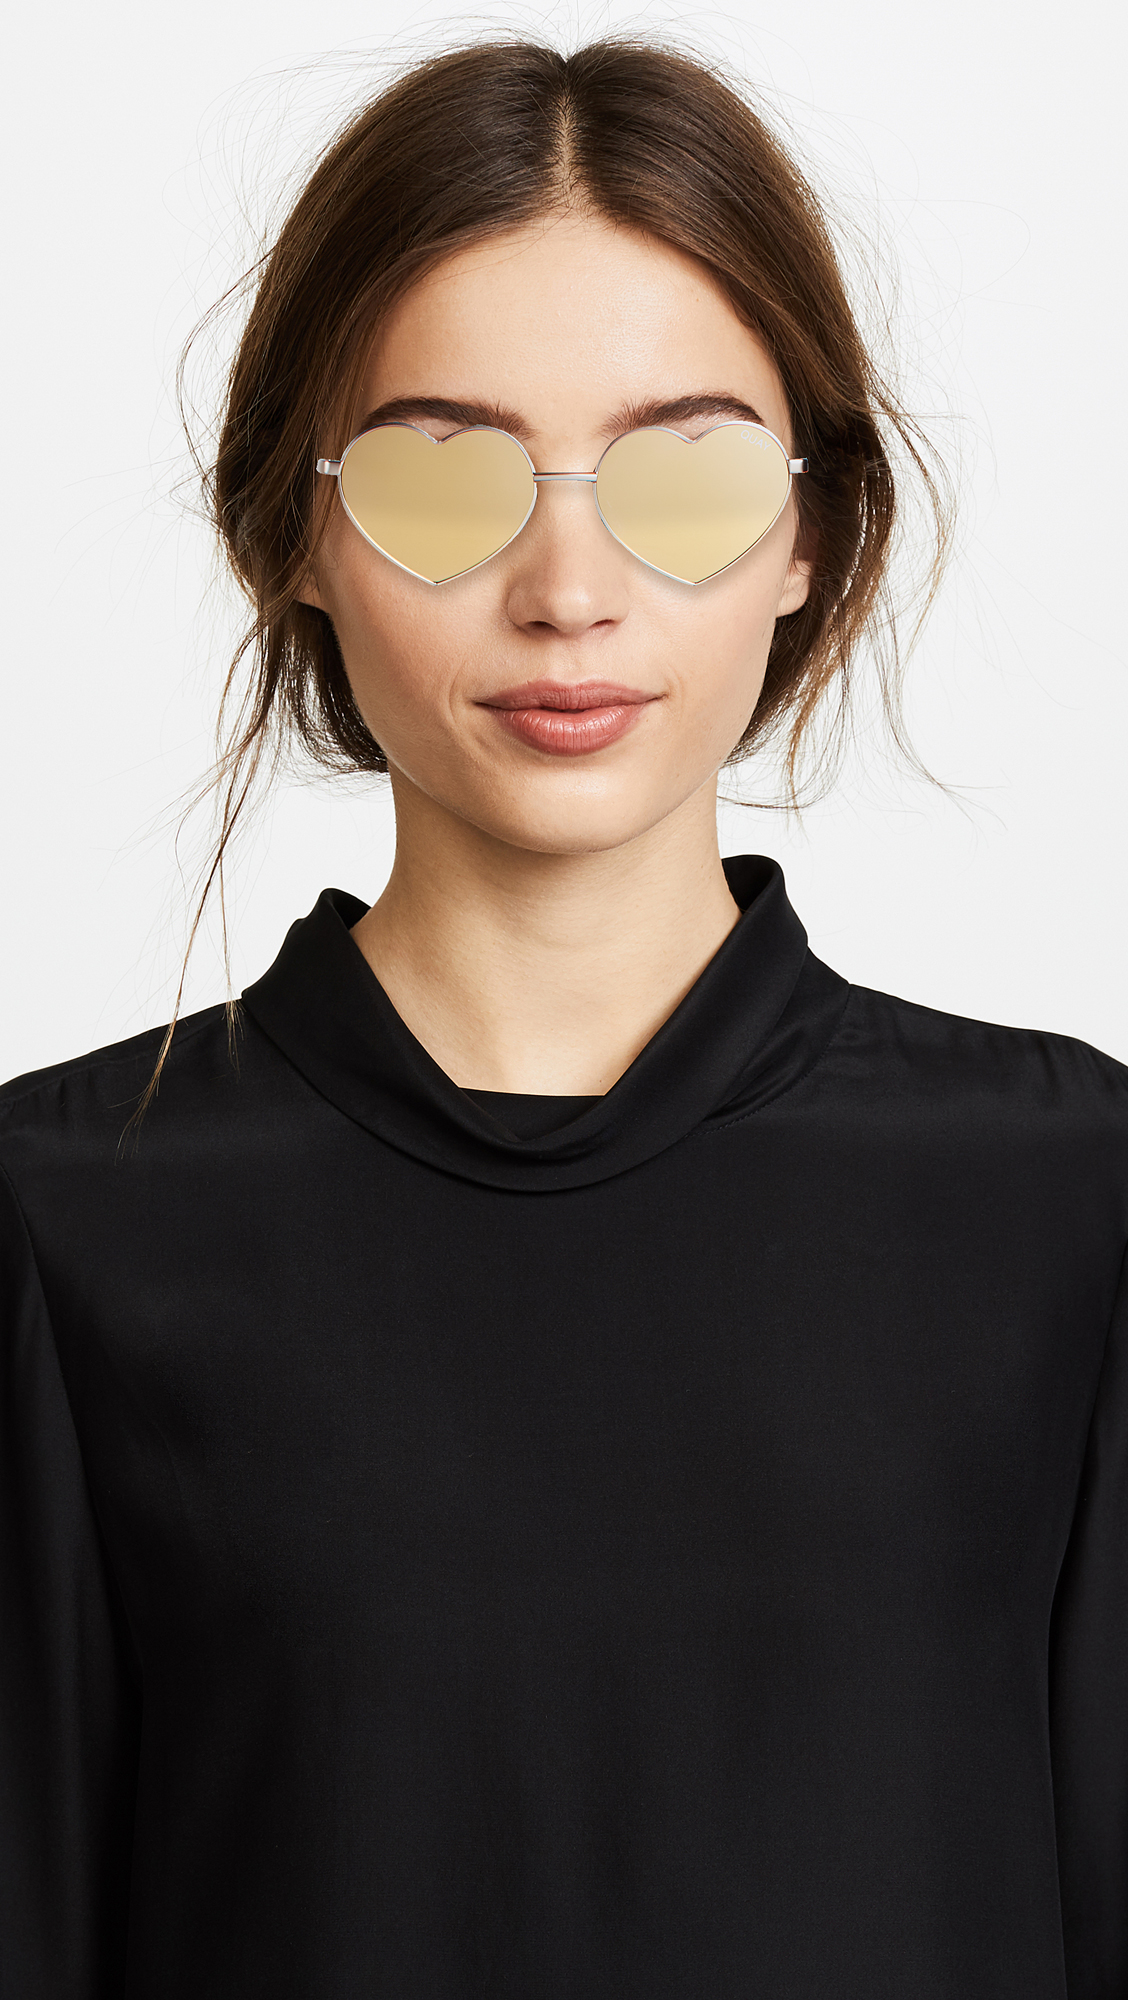 6bad1bdb23838 Quay Heart Breaker Sunglasses